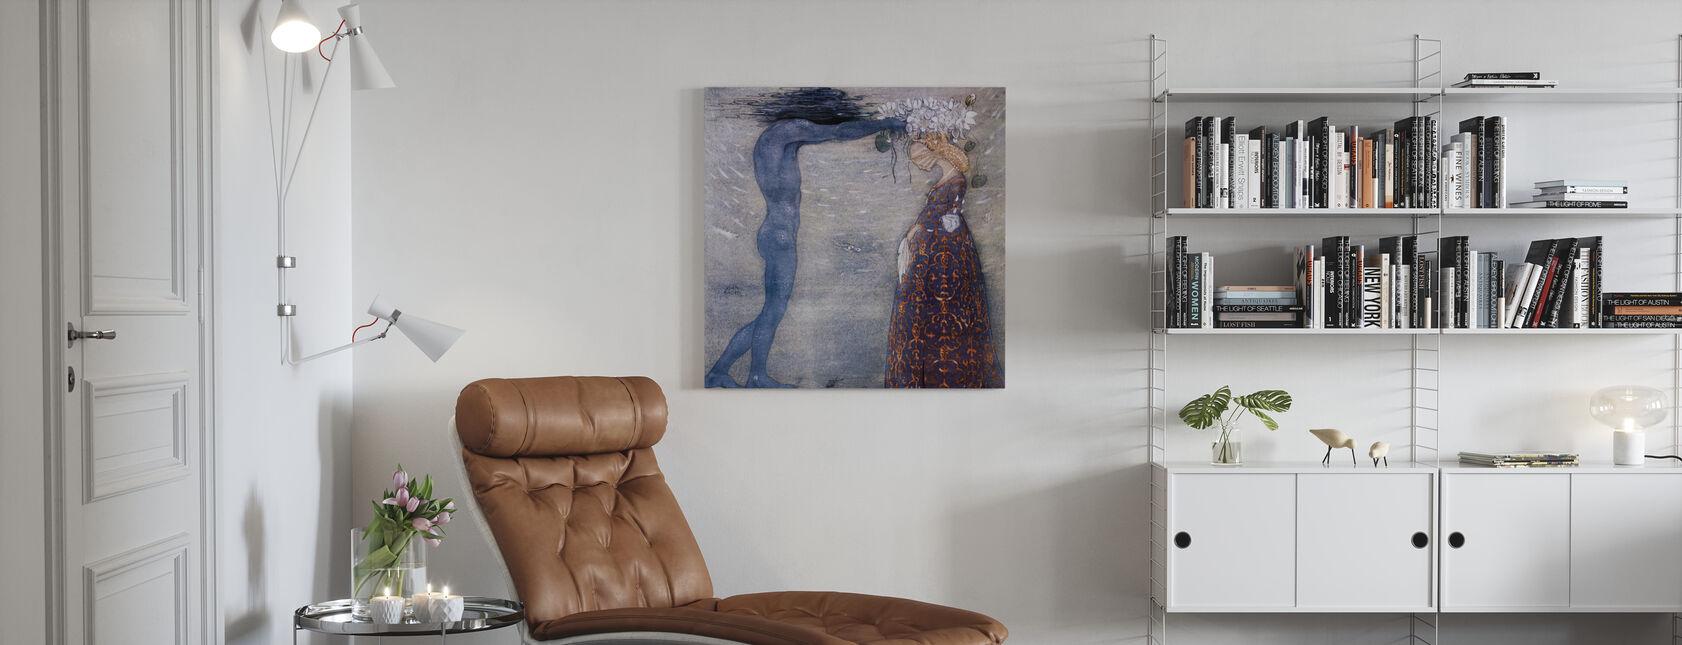 John Bauer - Agneta en de jacht op zee - Canvas print - Woonkamer